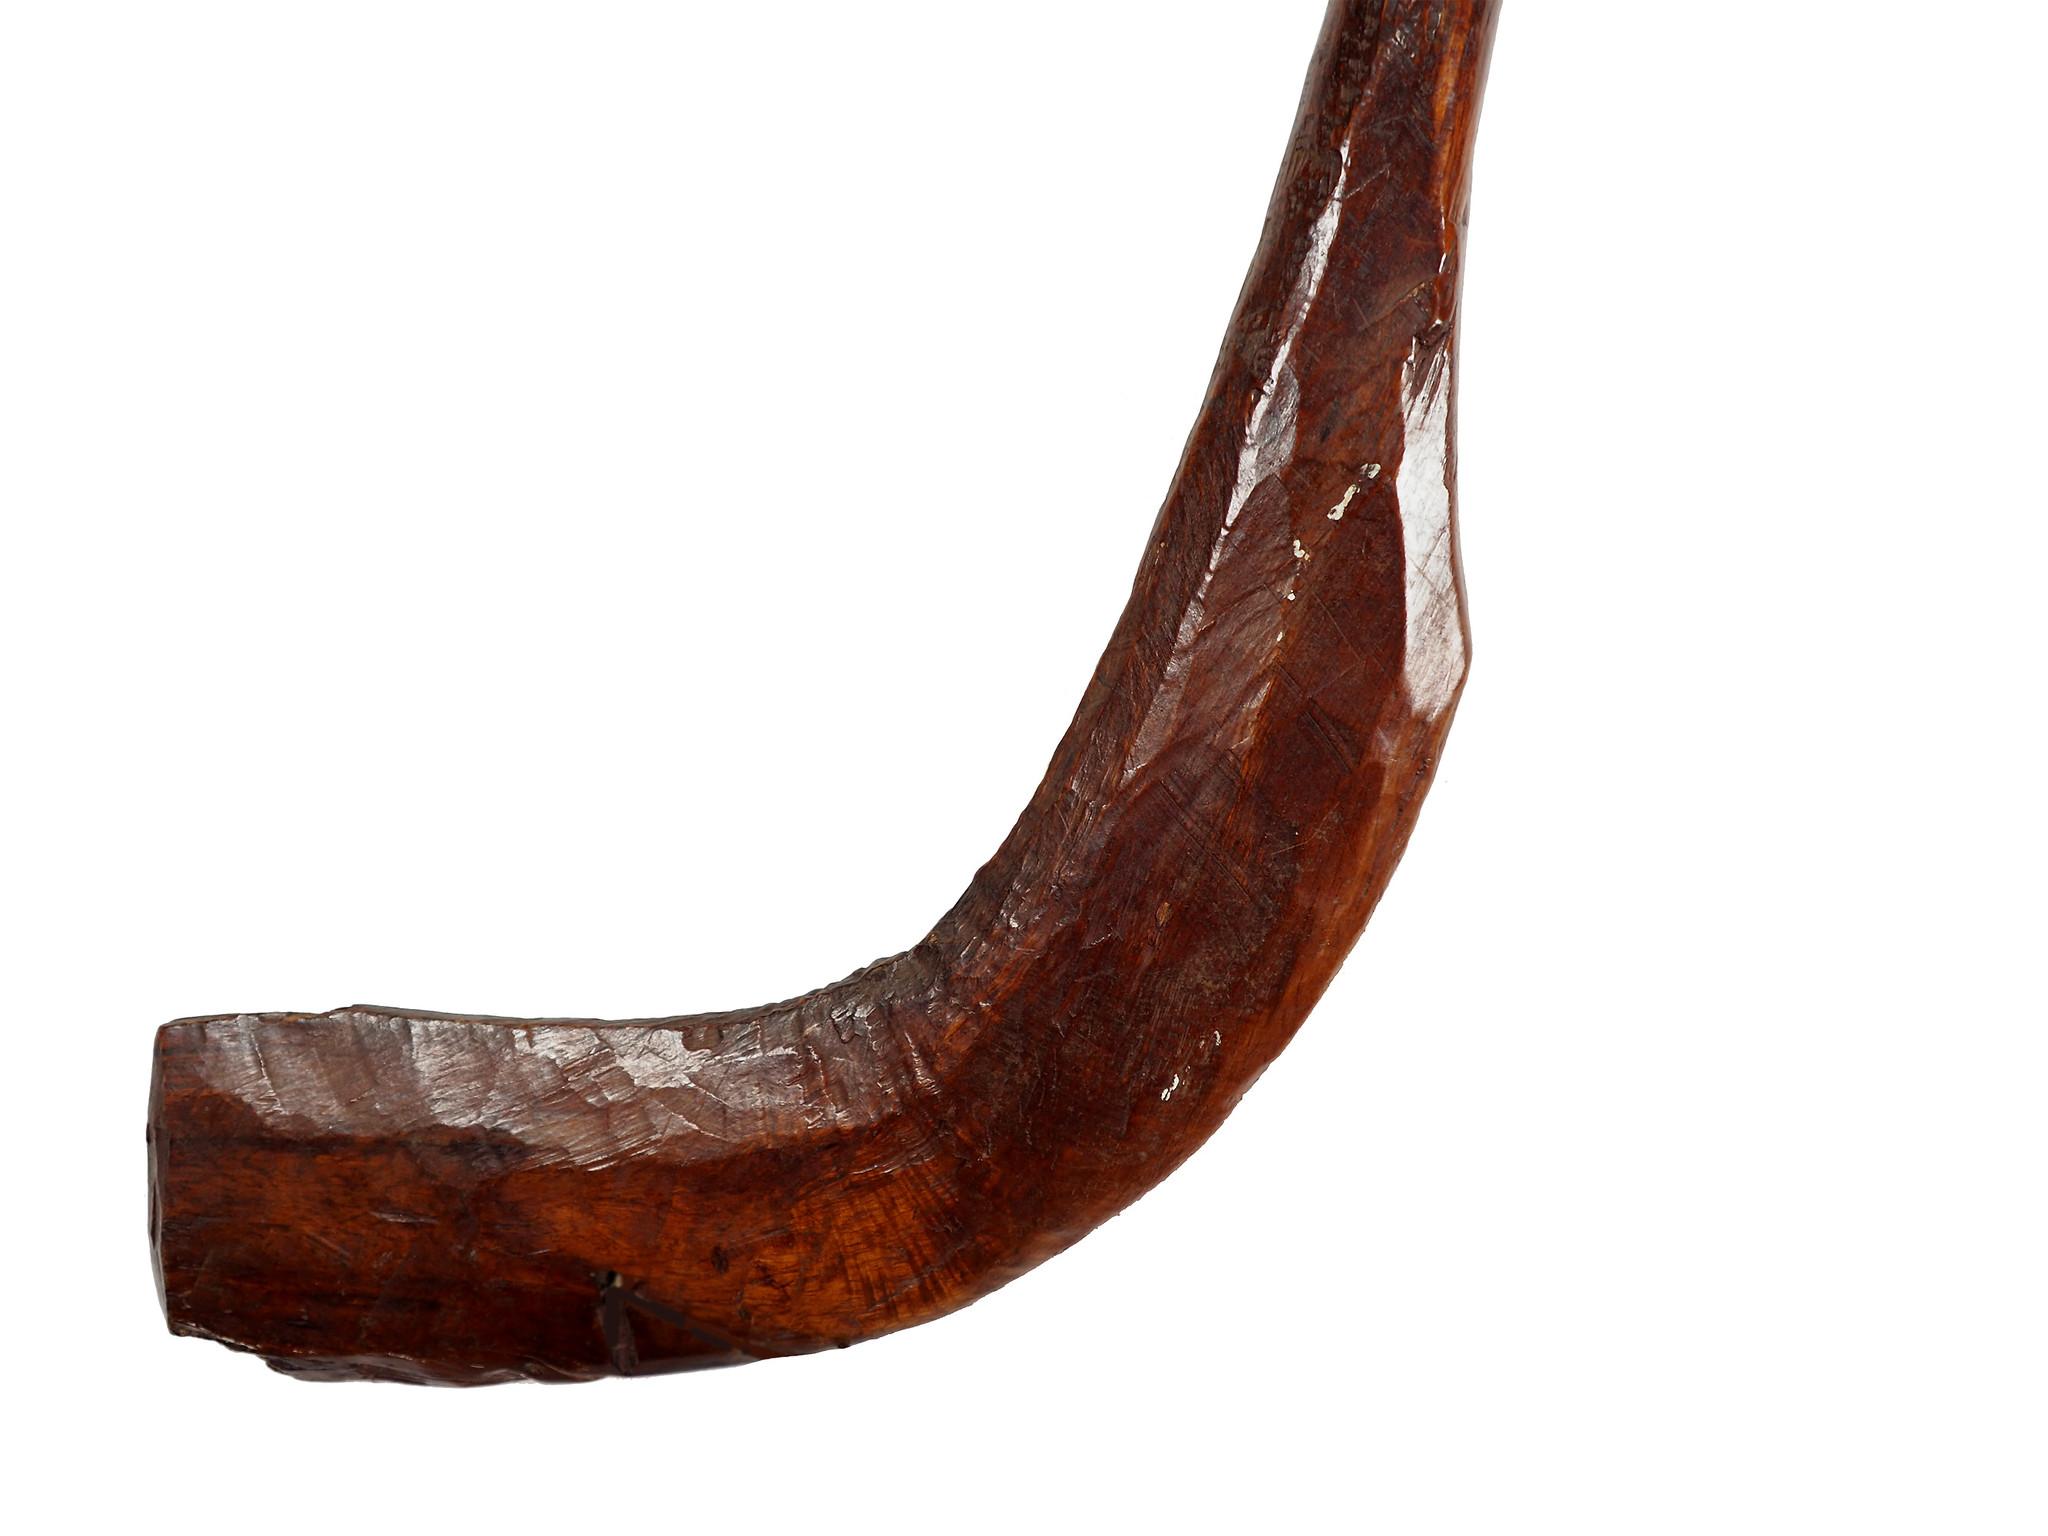 antique  cedar wood  Wheat Thresher weizen Drescher from Nuristan Afghanistan NO:20/B